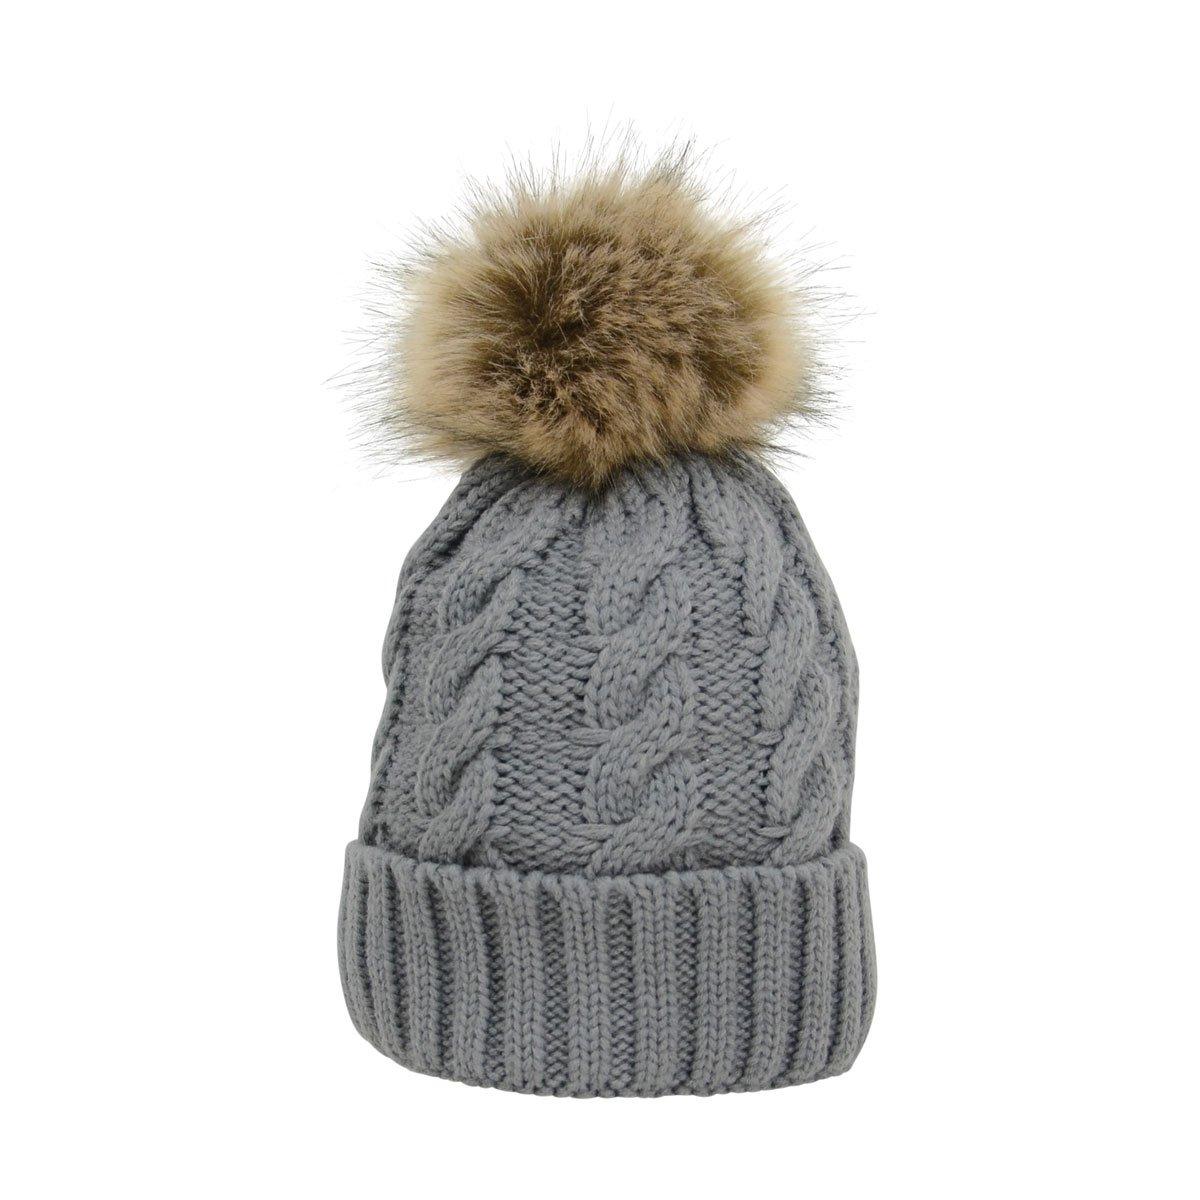 219c454e29f Hy Fashion Melrose Cable Knit Bobble Hat Ladies - Eileen Douglas ...